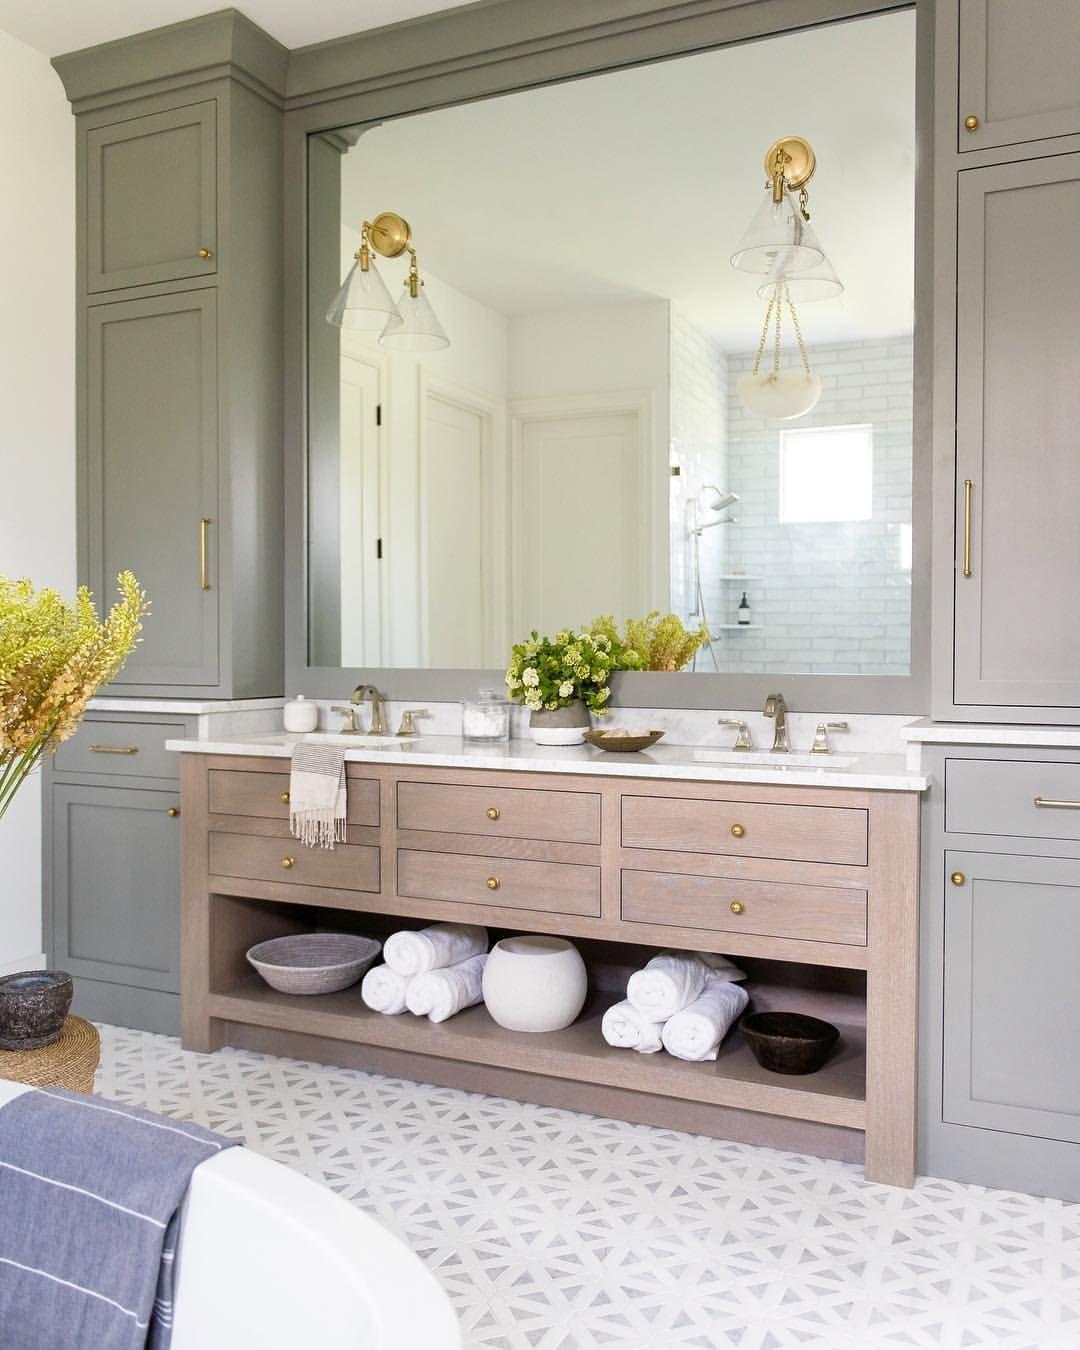 Small Bathroom Designs Ideas in 2019   Small master ... on Small Bathroom Remodel Ideas 2019  id=18161